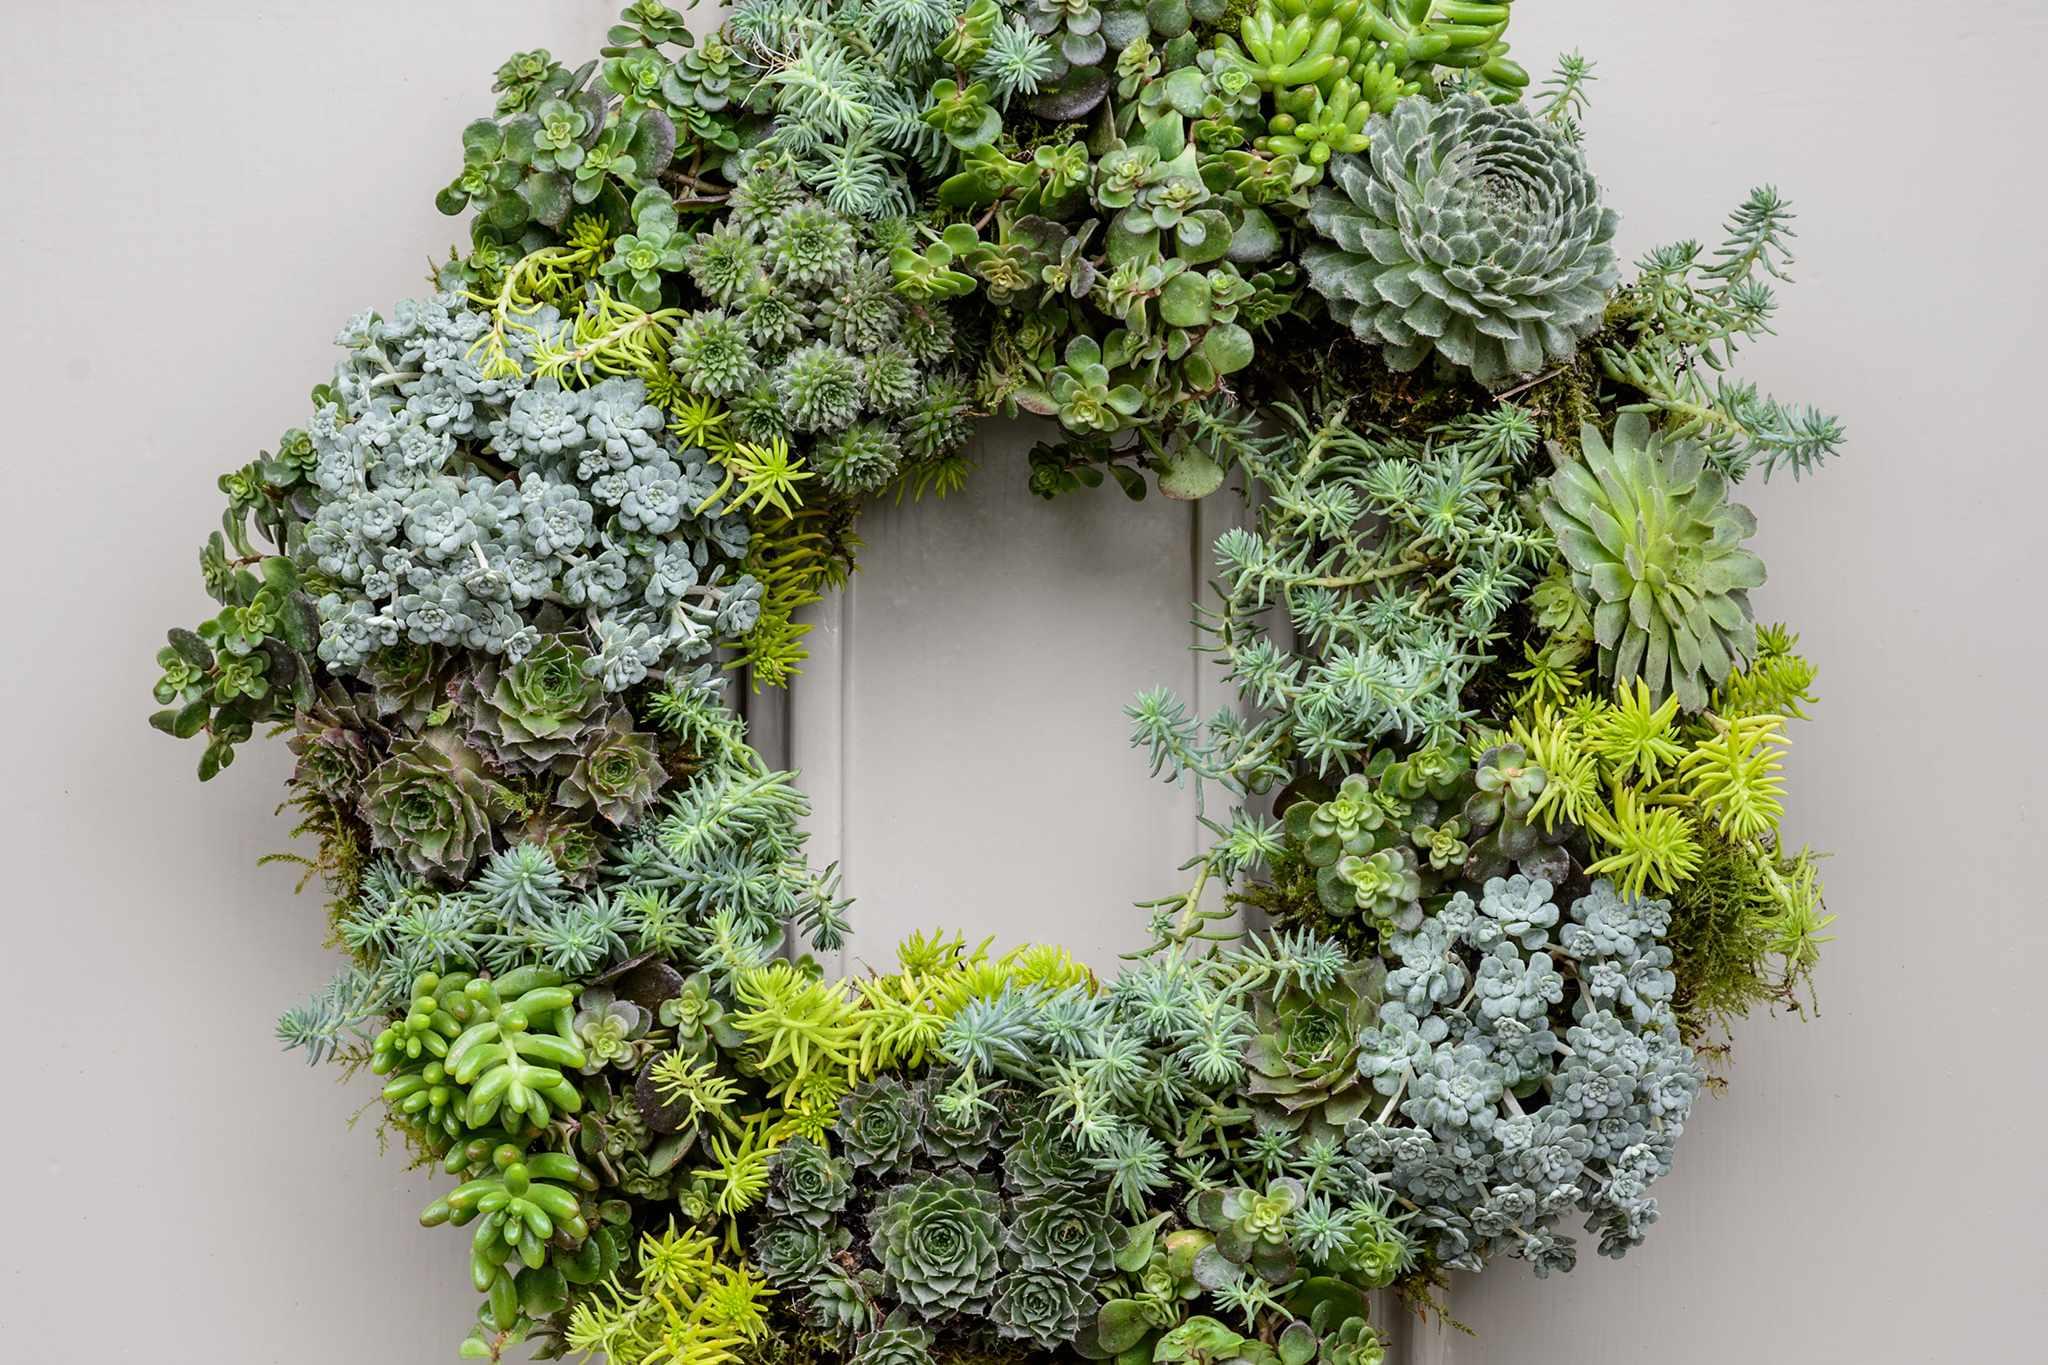 Living Christmas wreath